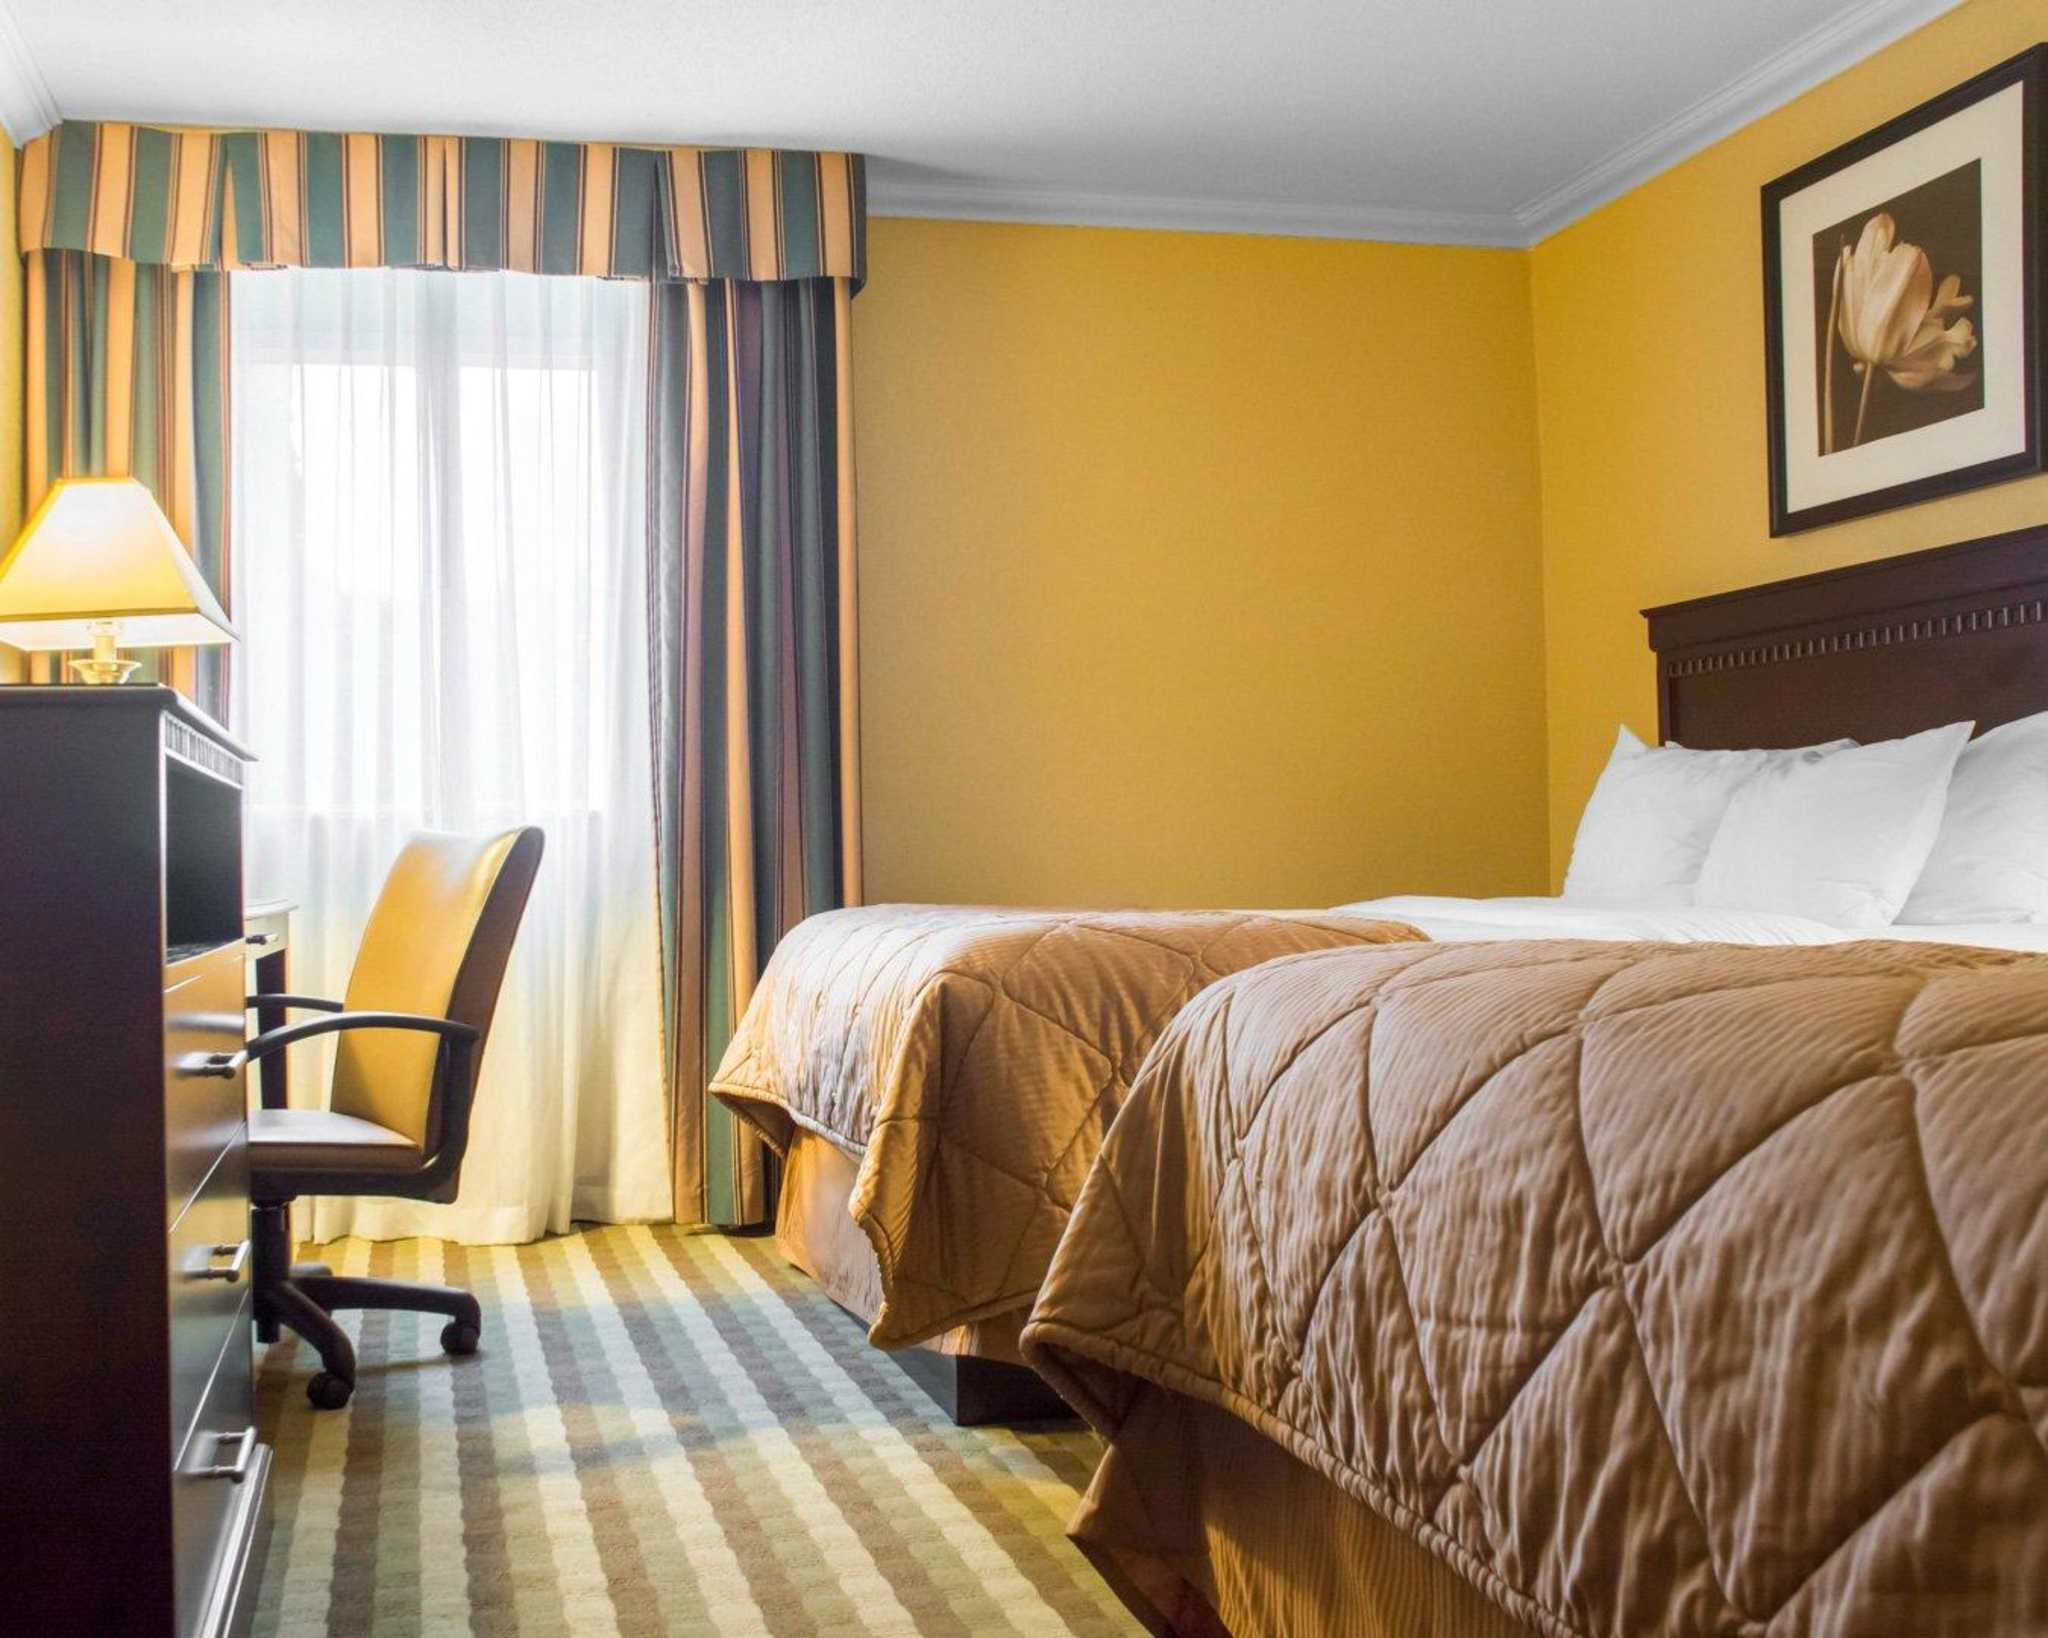 Quality Inn & Suites Fairgrounds image 24